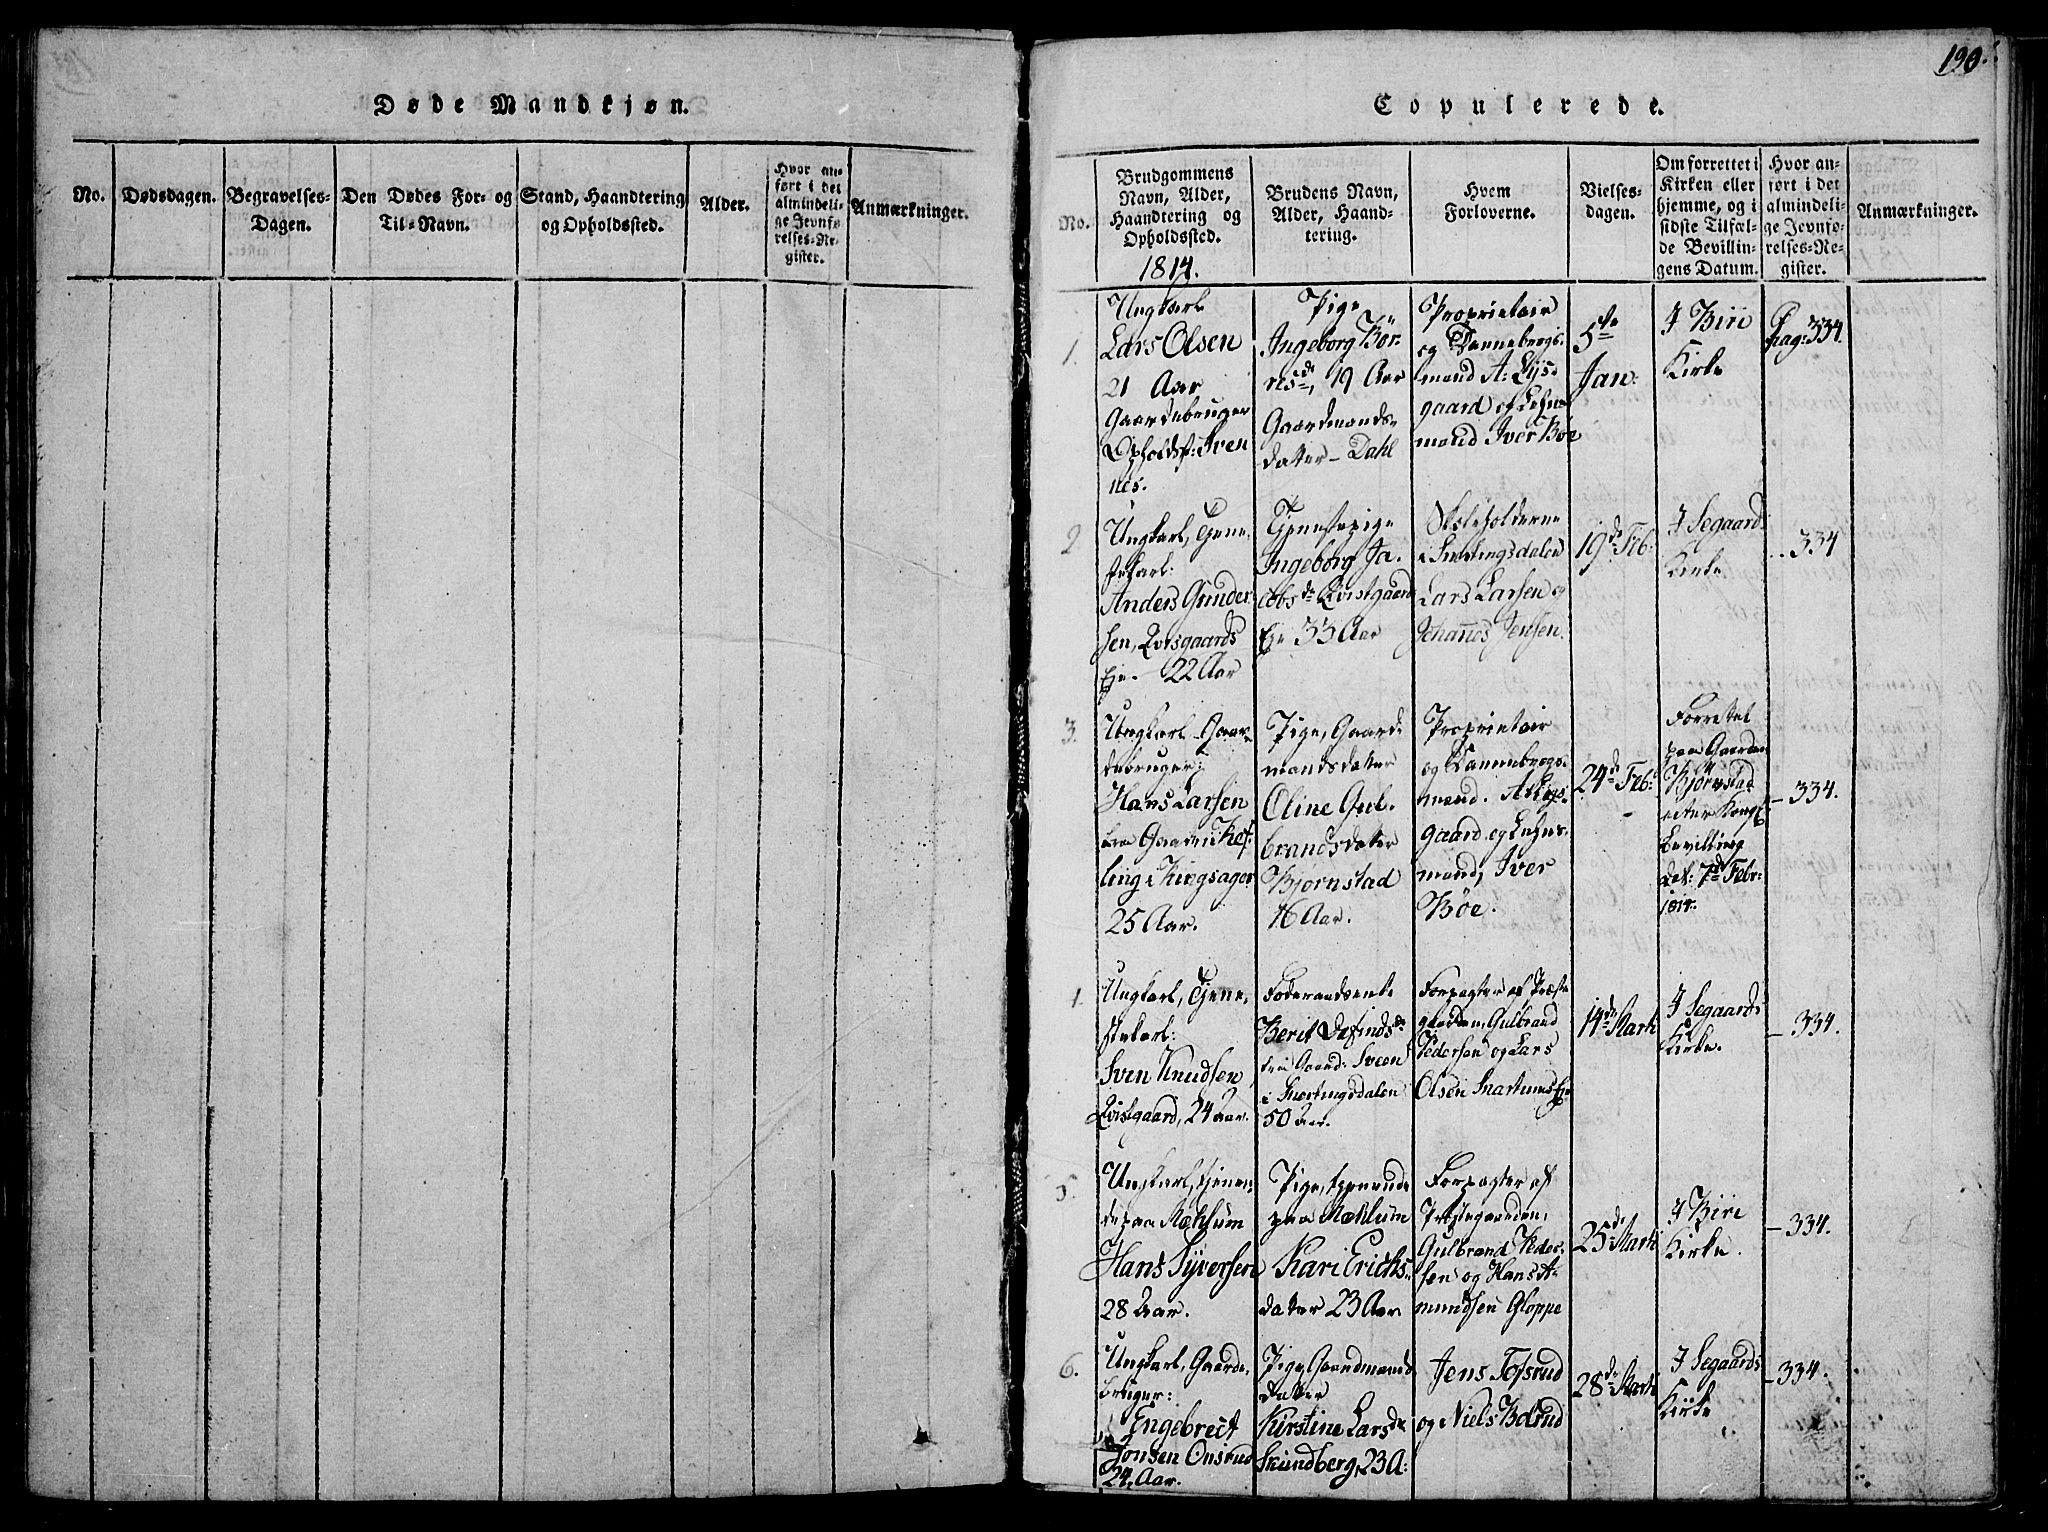 SAH, Biri prestekontor, Ministerialbok nr. 3, 1814-1828, s. 190